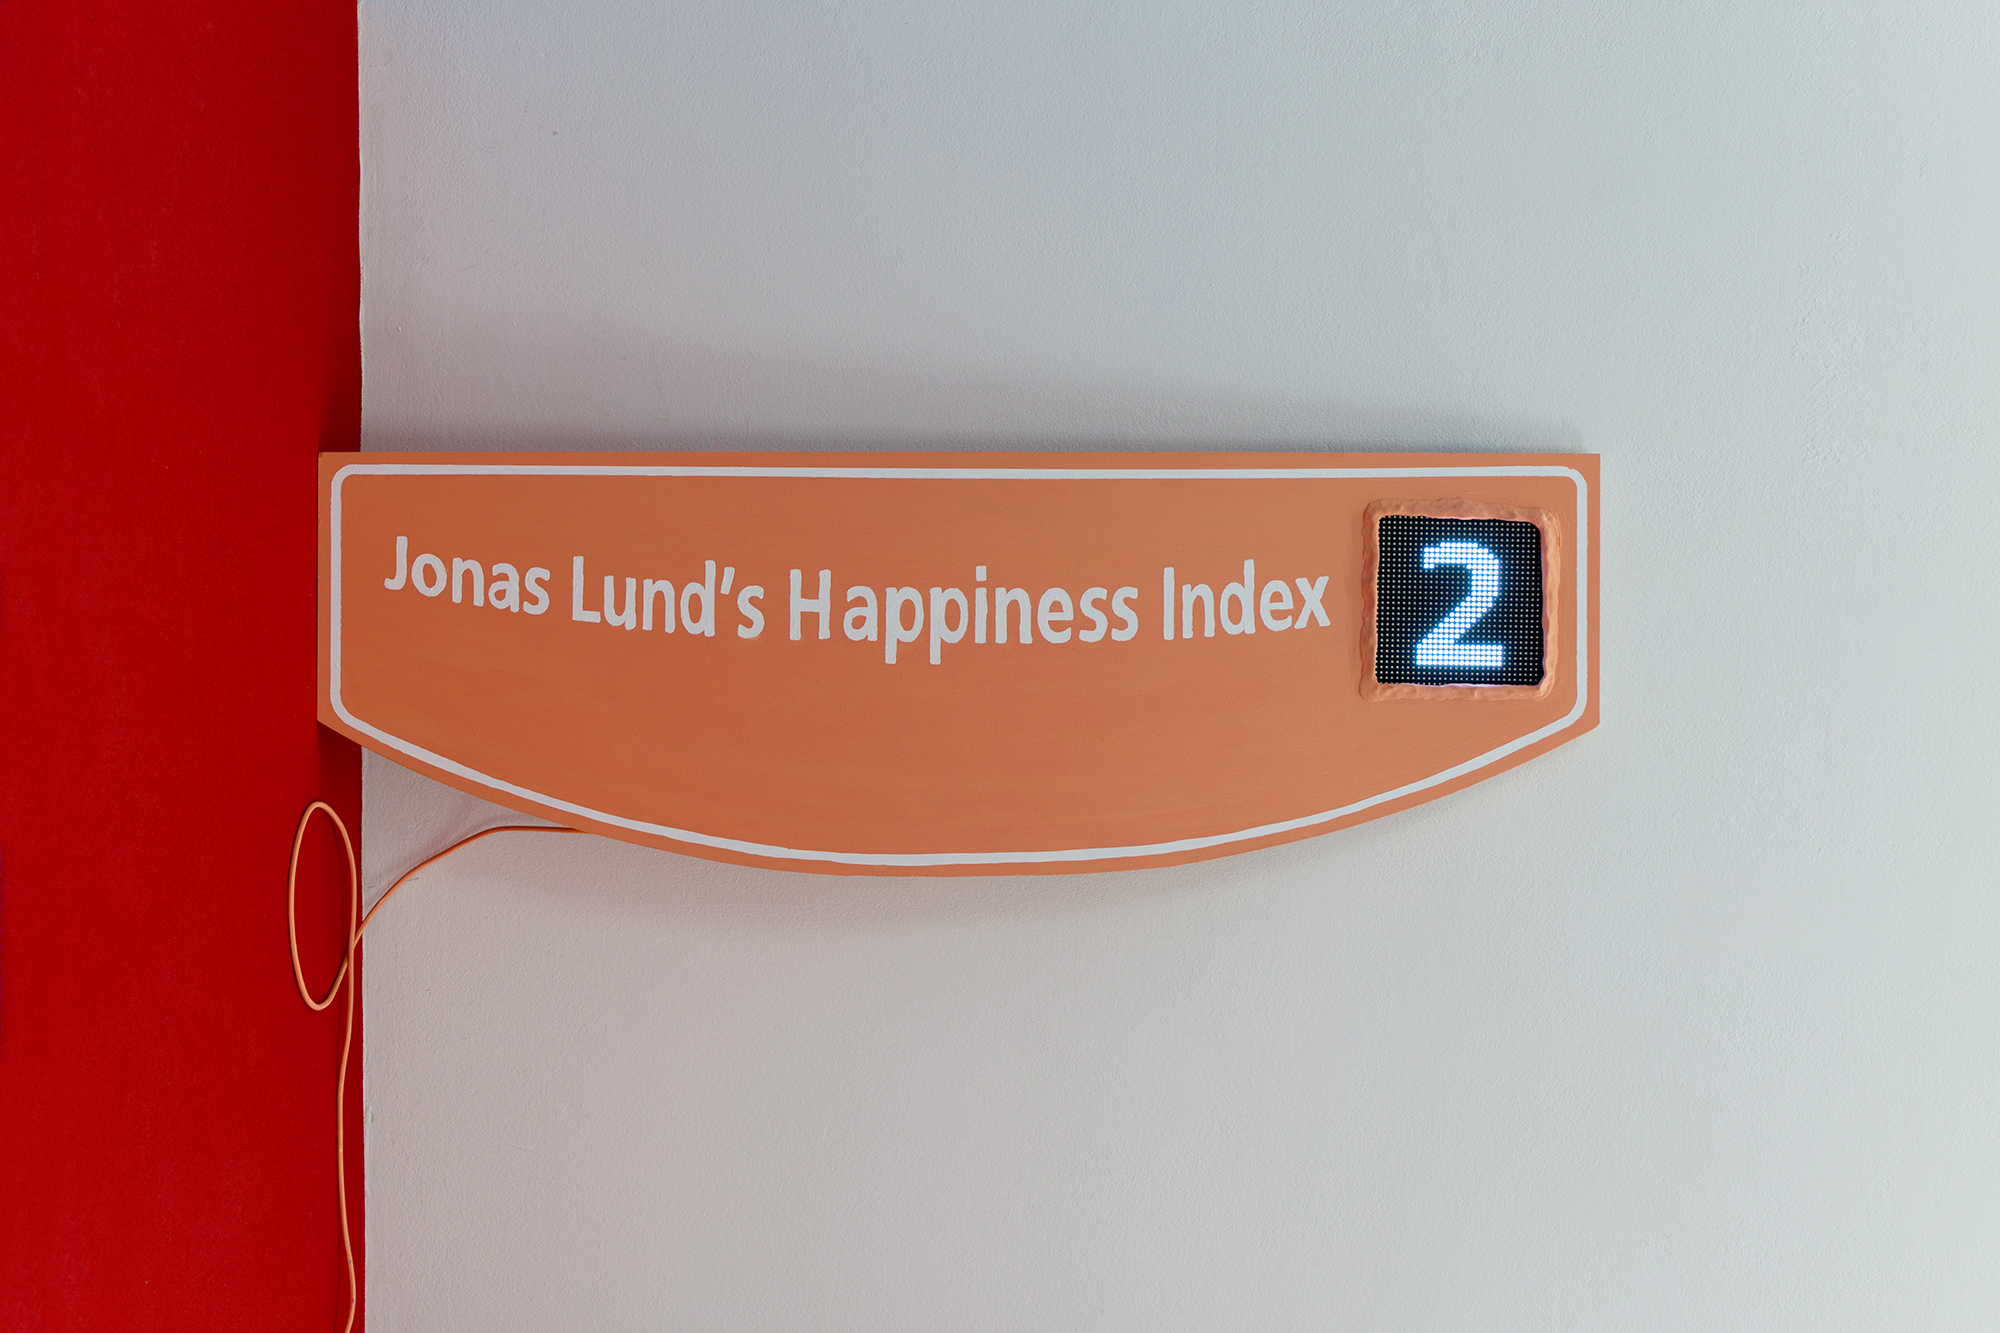 Jonas Lund Jonas Lund's Happiness Index